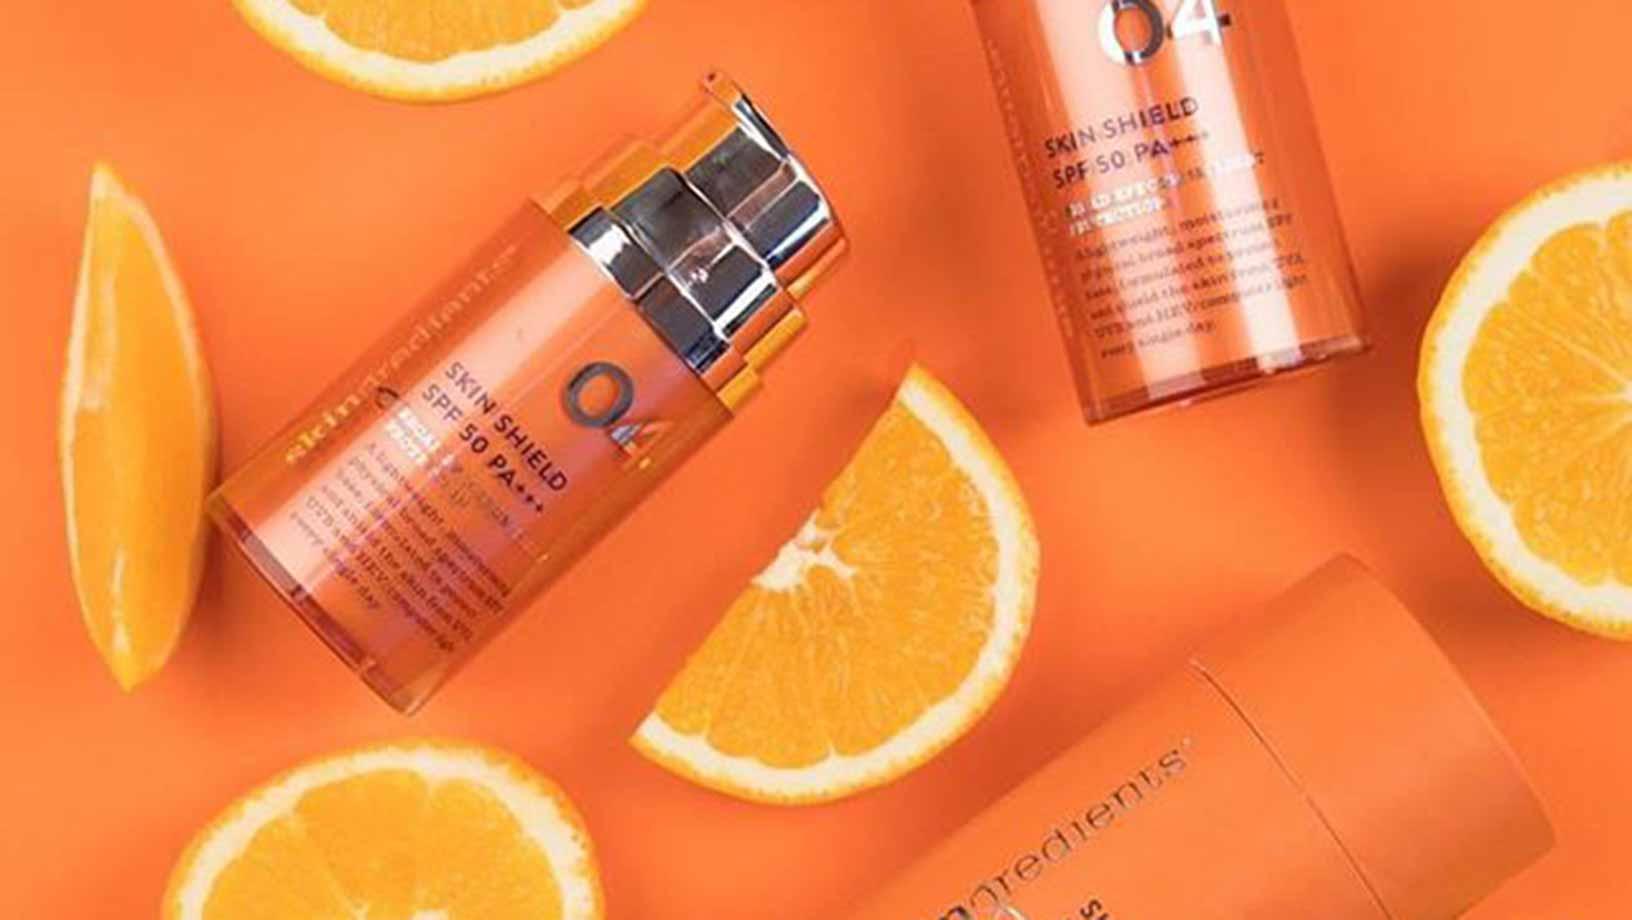 Skingredient Skin Shield SPF 50+++ on an orange background surrounded with orange segments